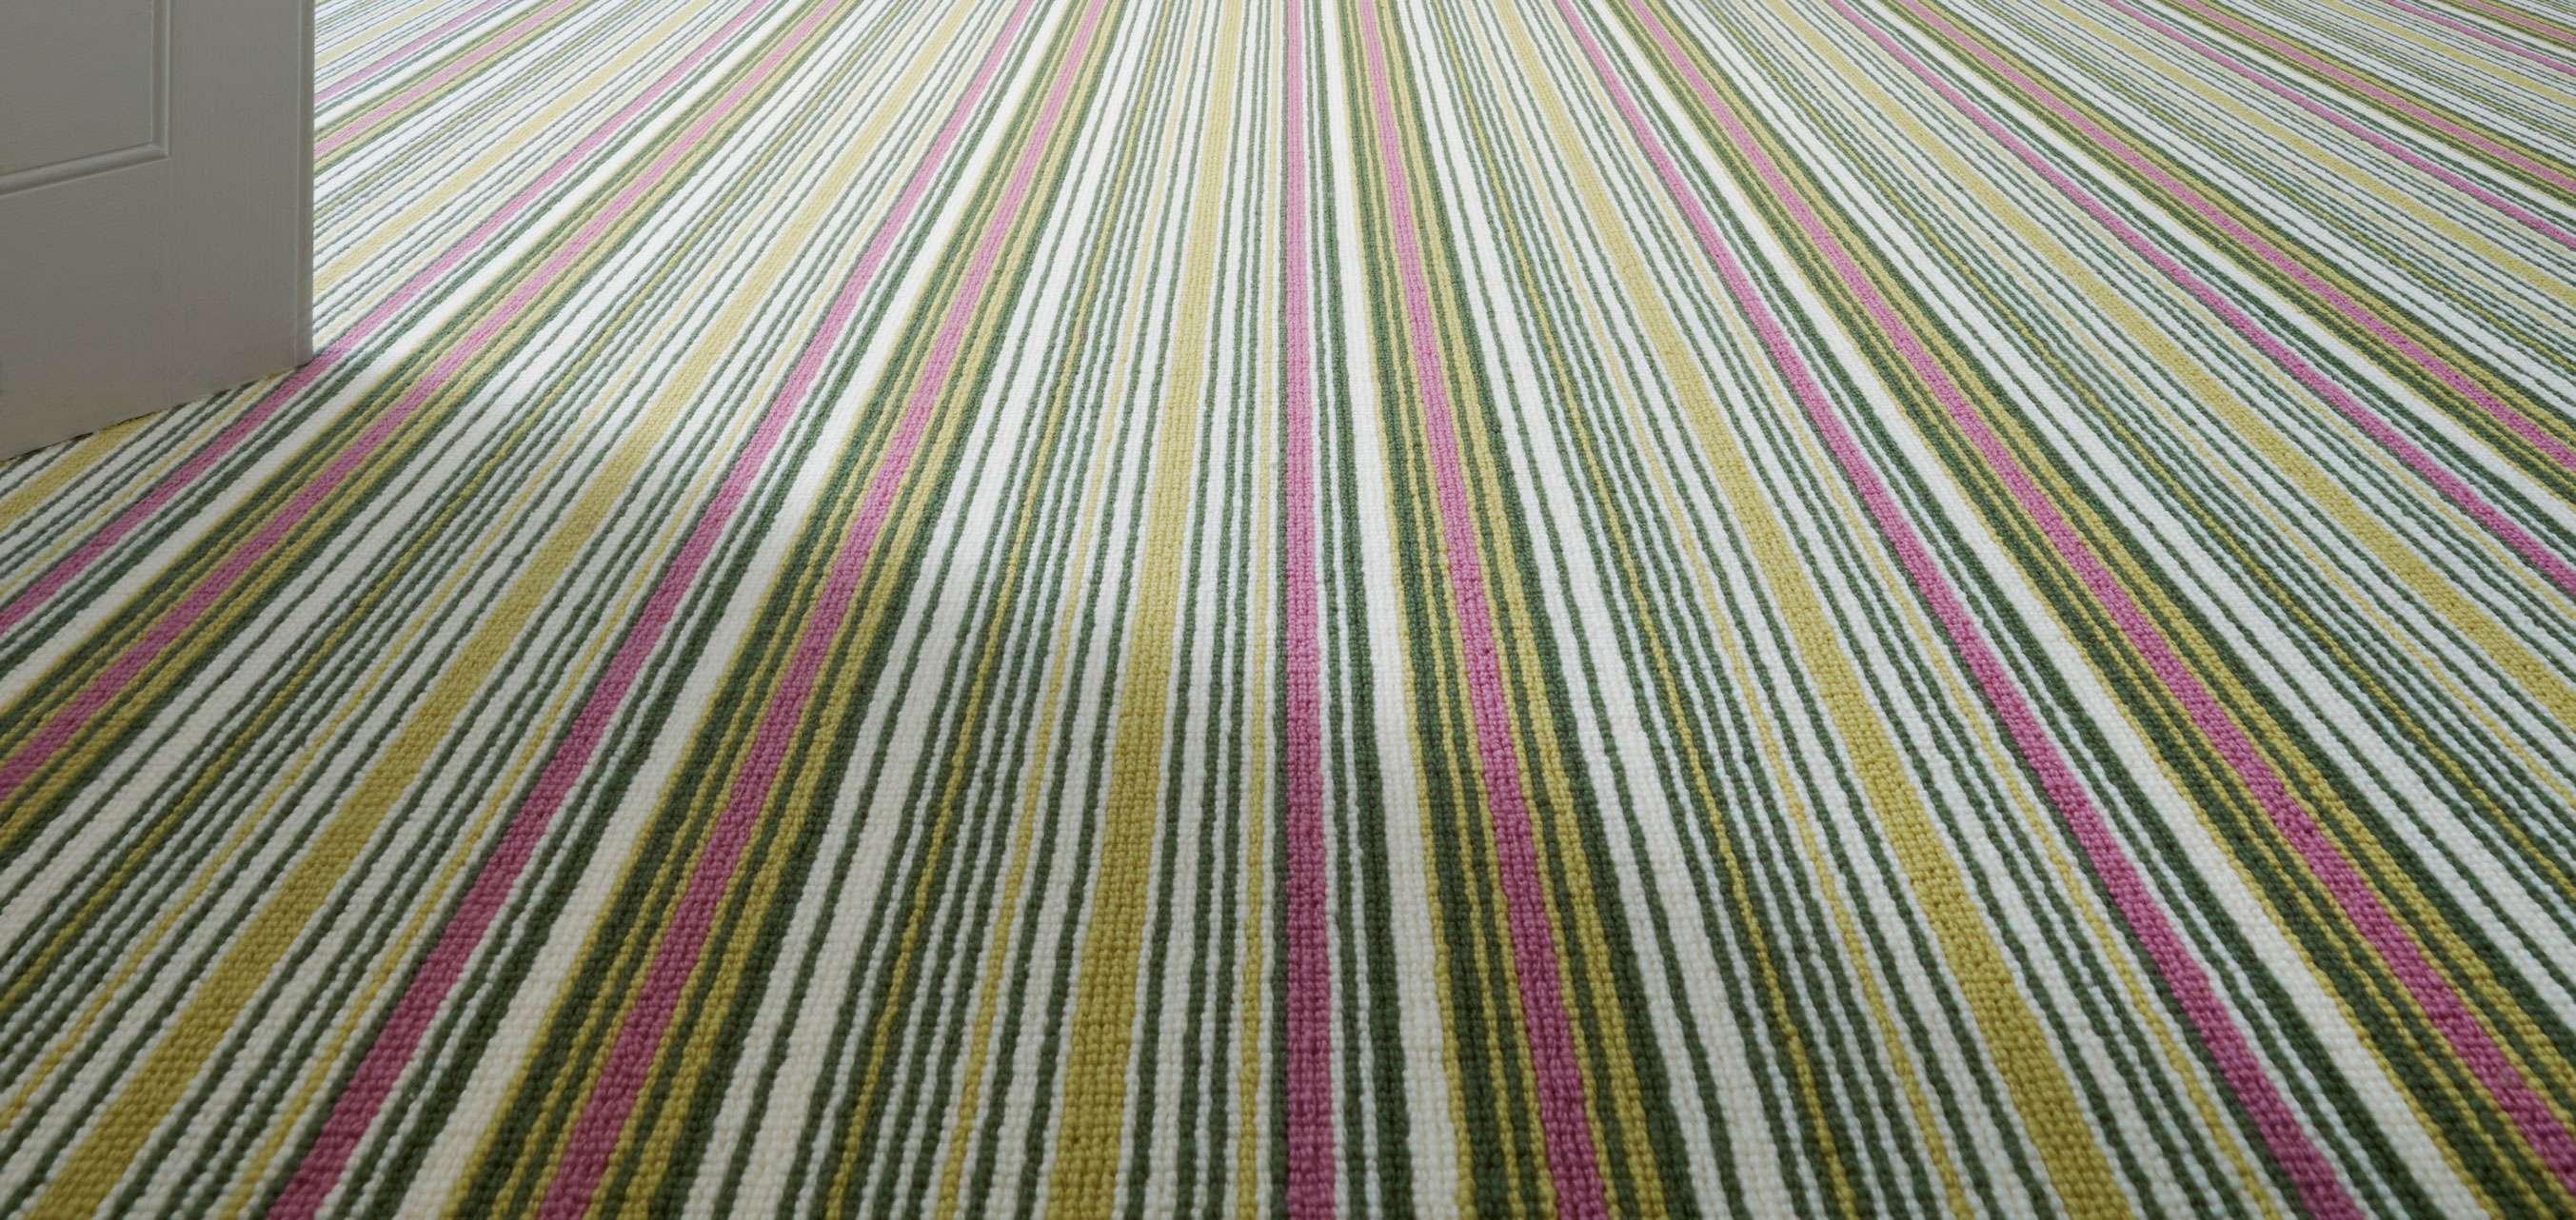 Carpet Striped Vidalondon - Lentine Marine